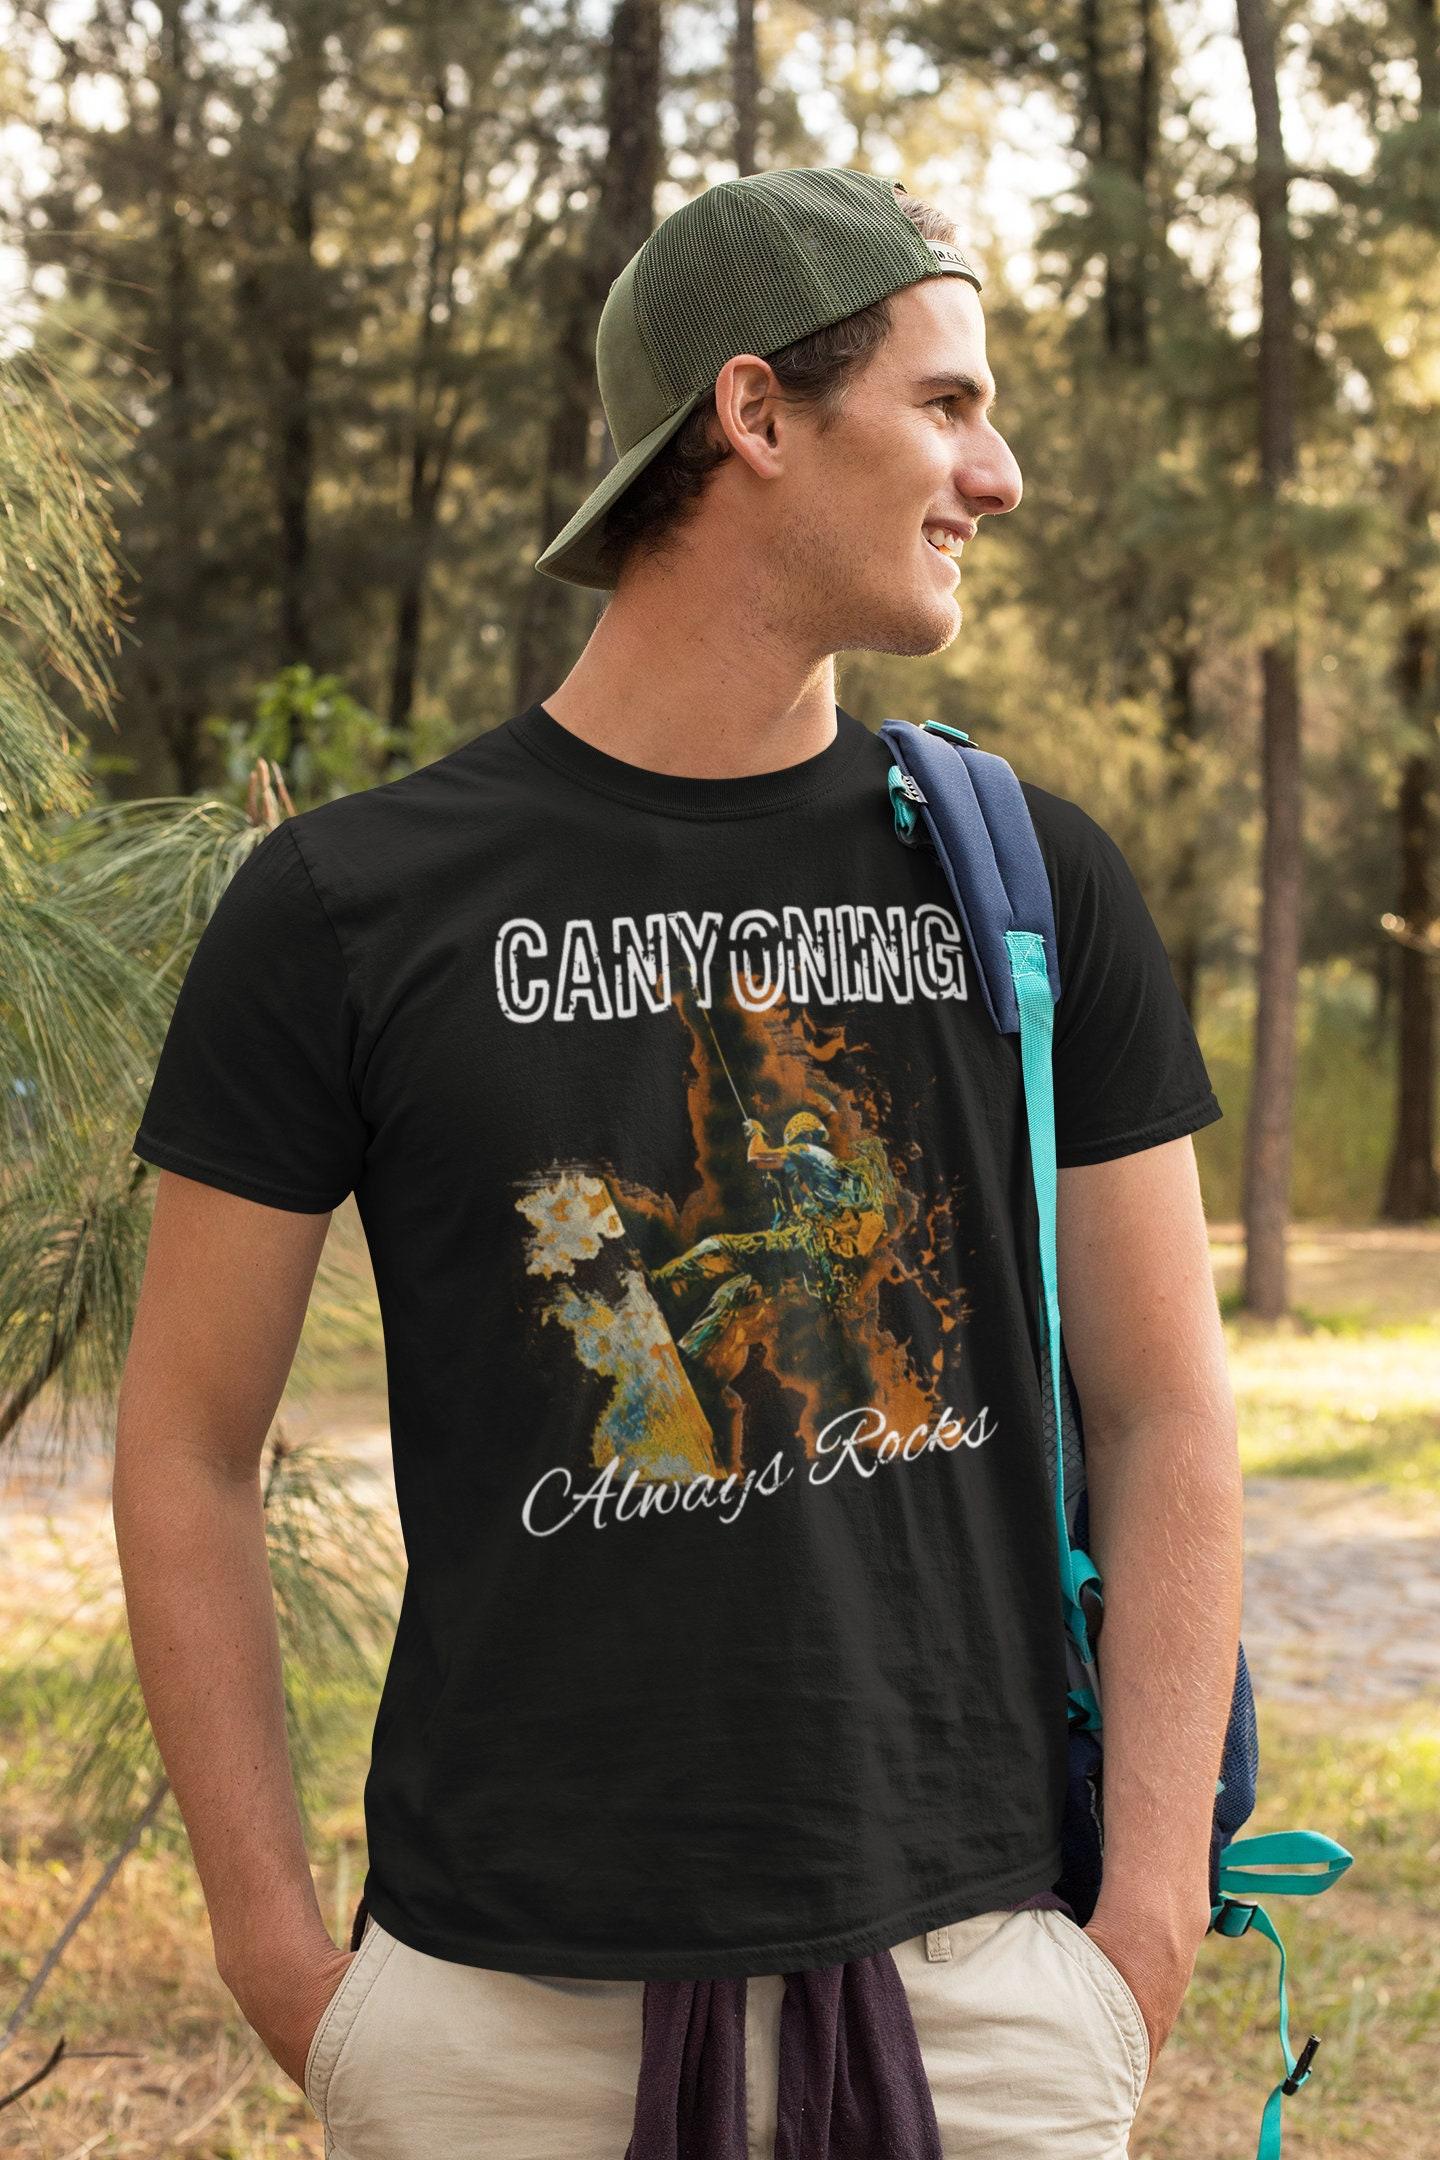 Mountain Lover Gift Mountain Climber T Shirt, Mountaineer Climber Shirt Mountain Shirt Climber Gift Mountain Lover Shirt Mountain Gift